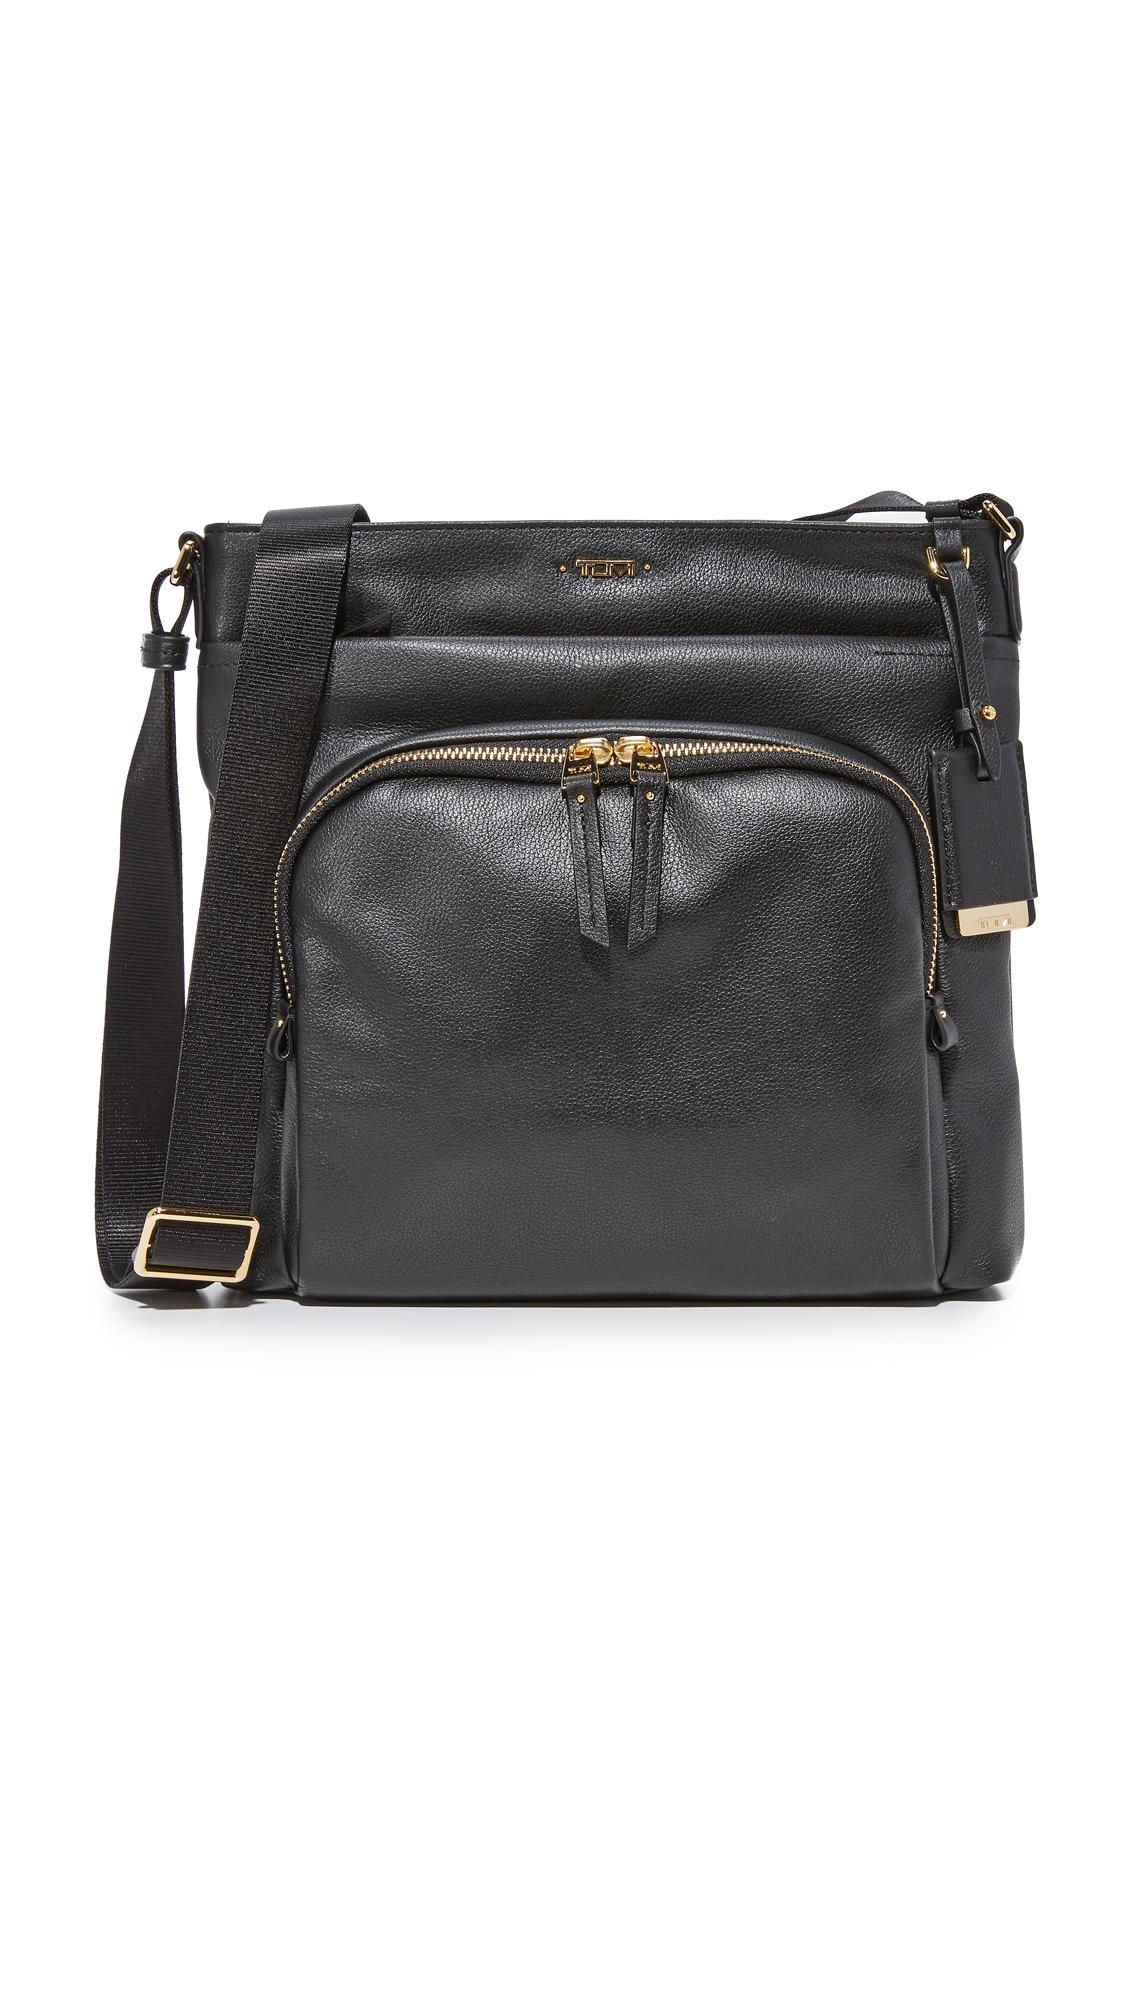 Tumi Capri Cross Body Bag - Black